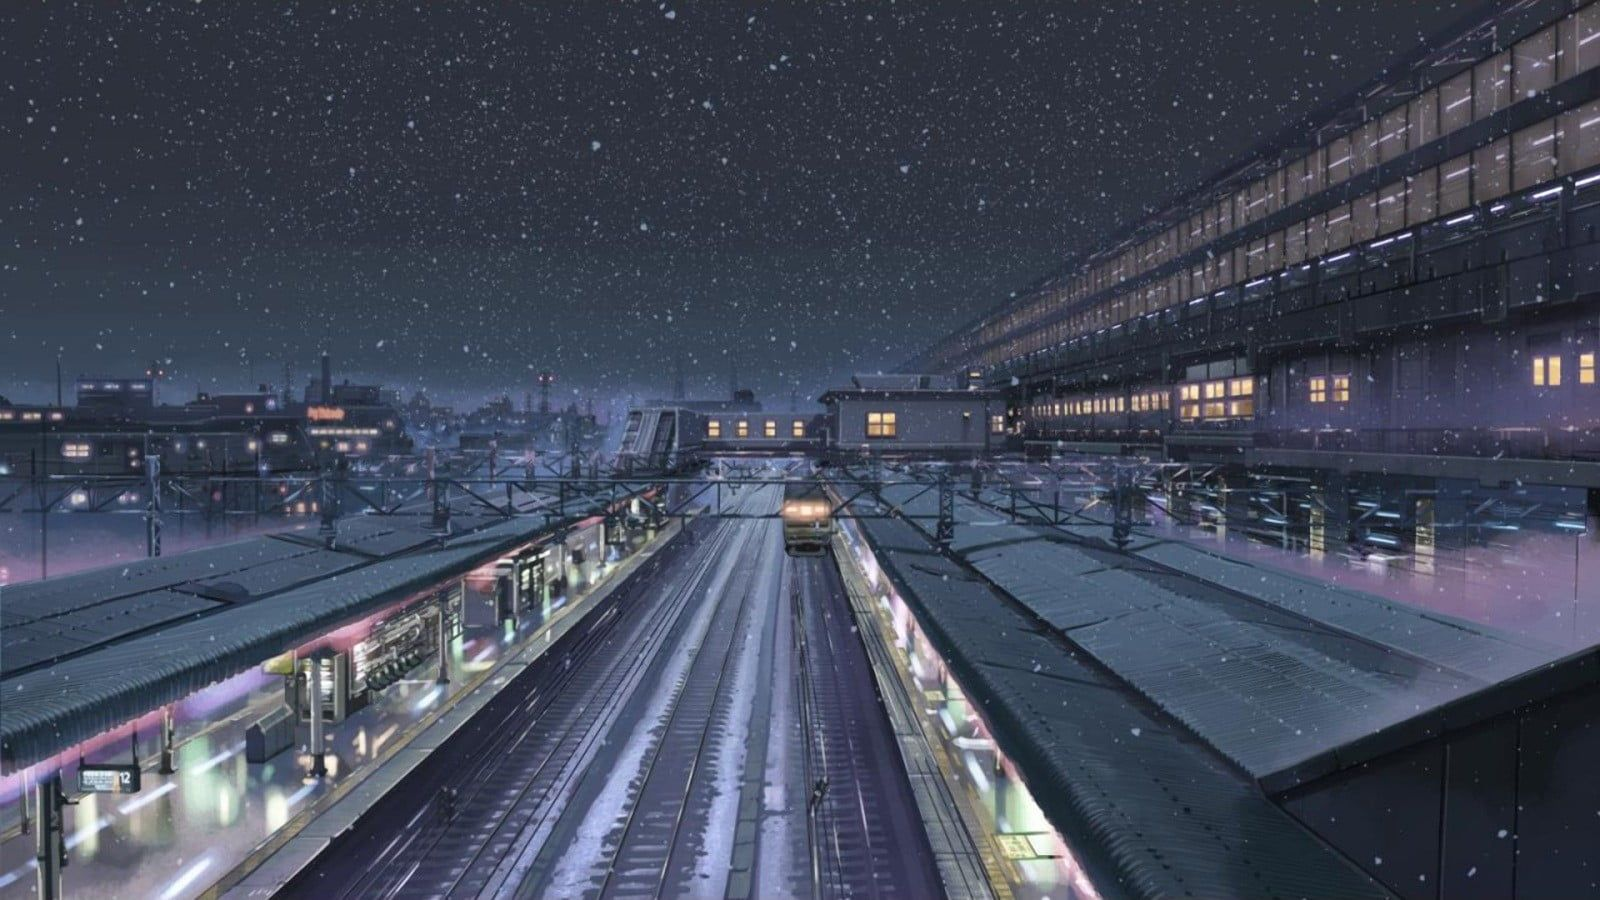 Train Station Animation 5 Centimeters Per Second Makoto Shinkai Snow Train Station Night Winter 720p Wallpaper Hdwallpaper Desktop Hd wallpaper night snow city train